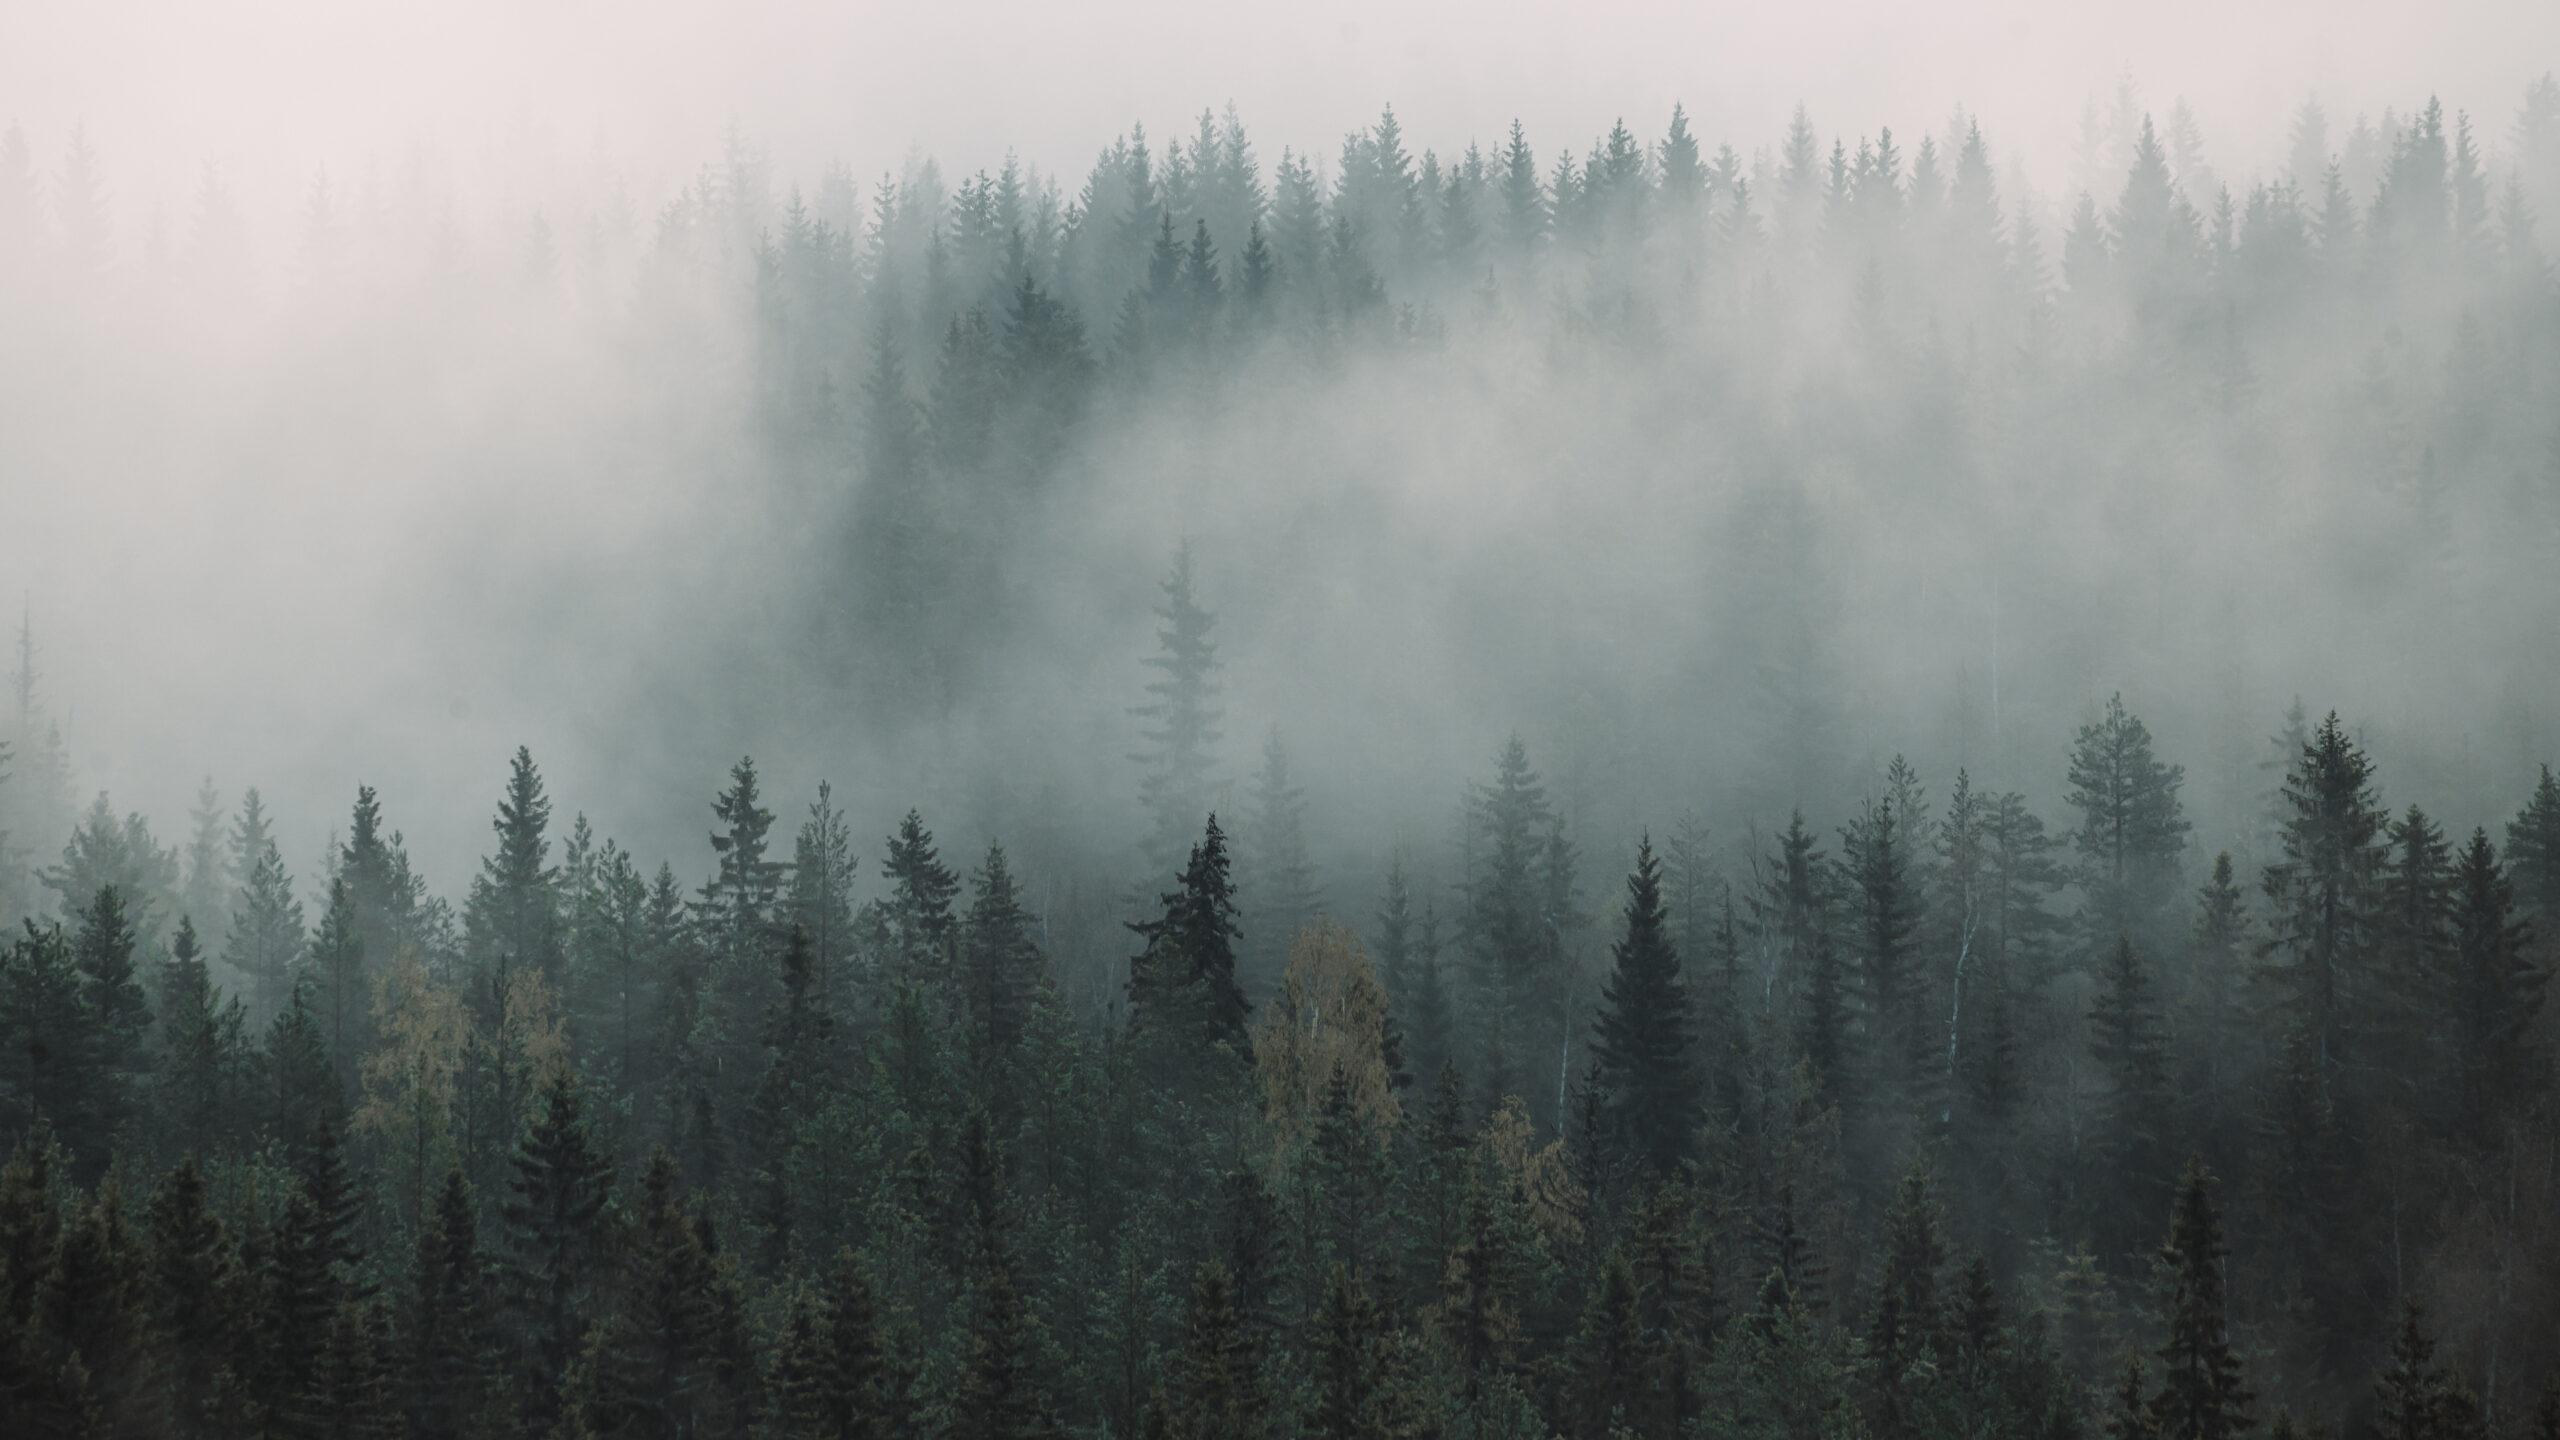 Tåkeskogen